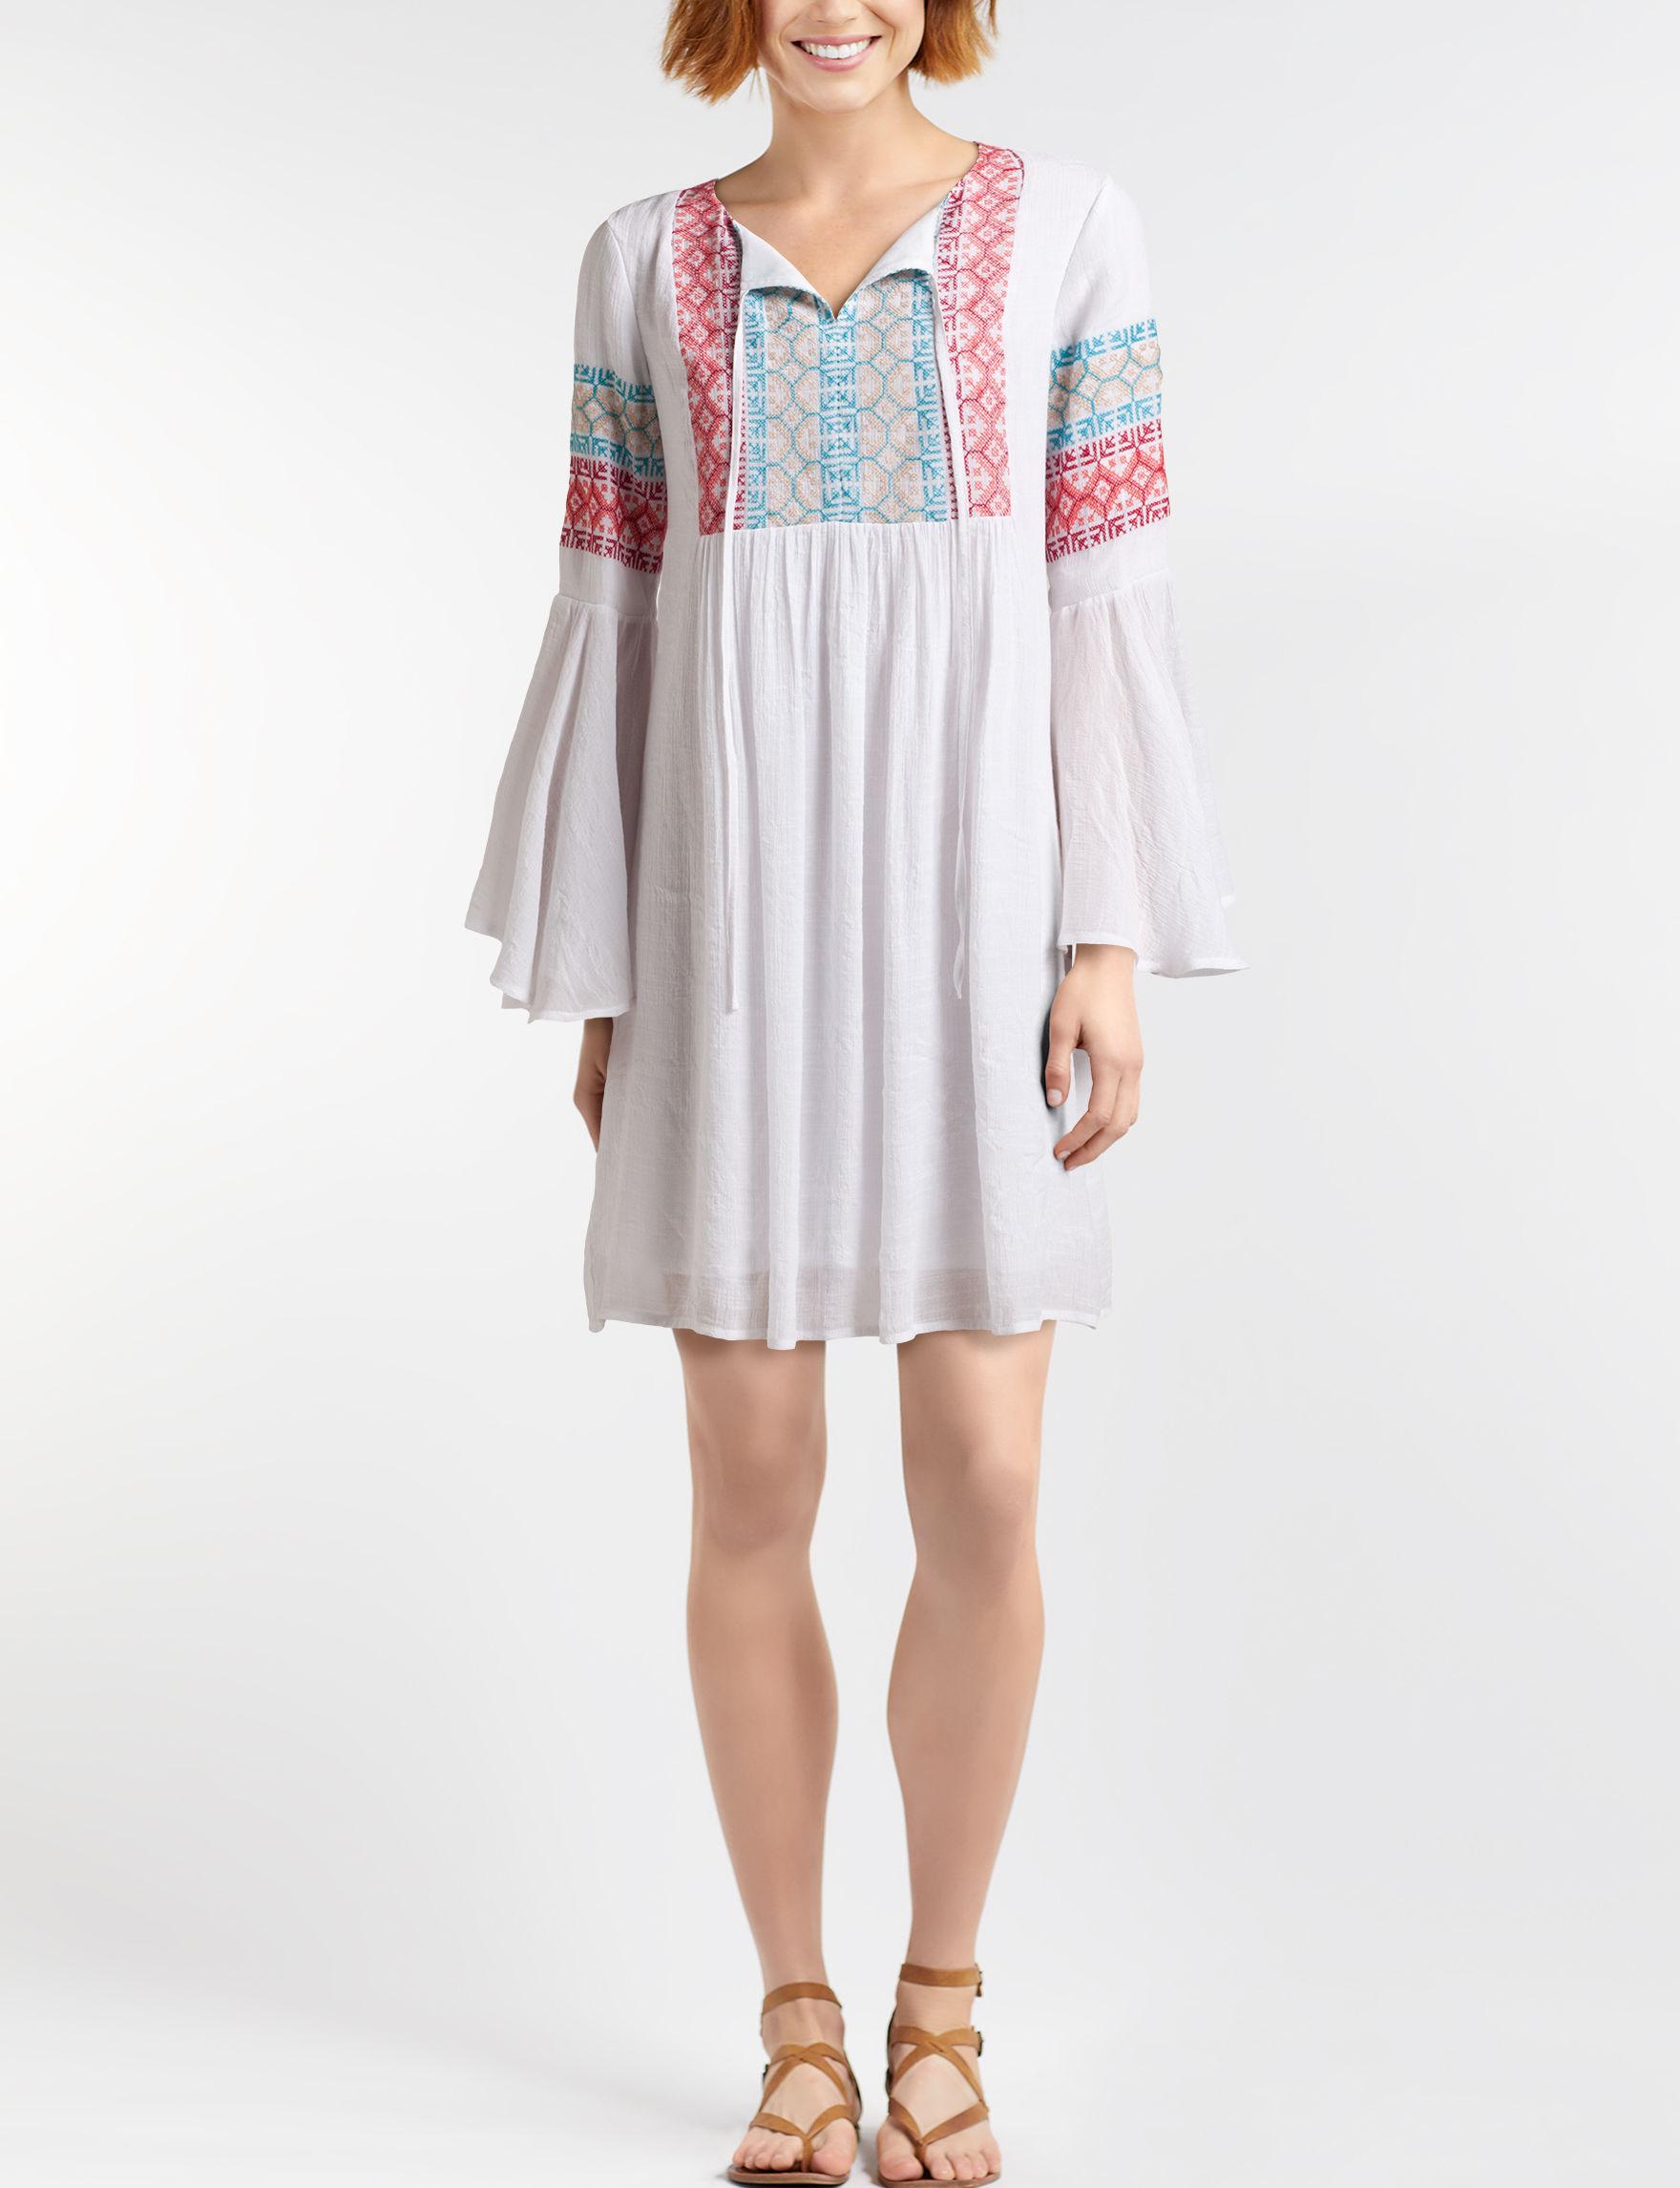 Nina Leonard White Everyday & Casual Shift Dresses